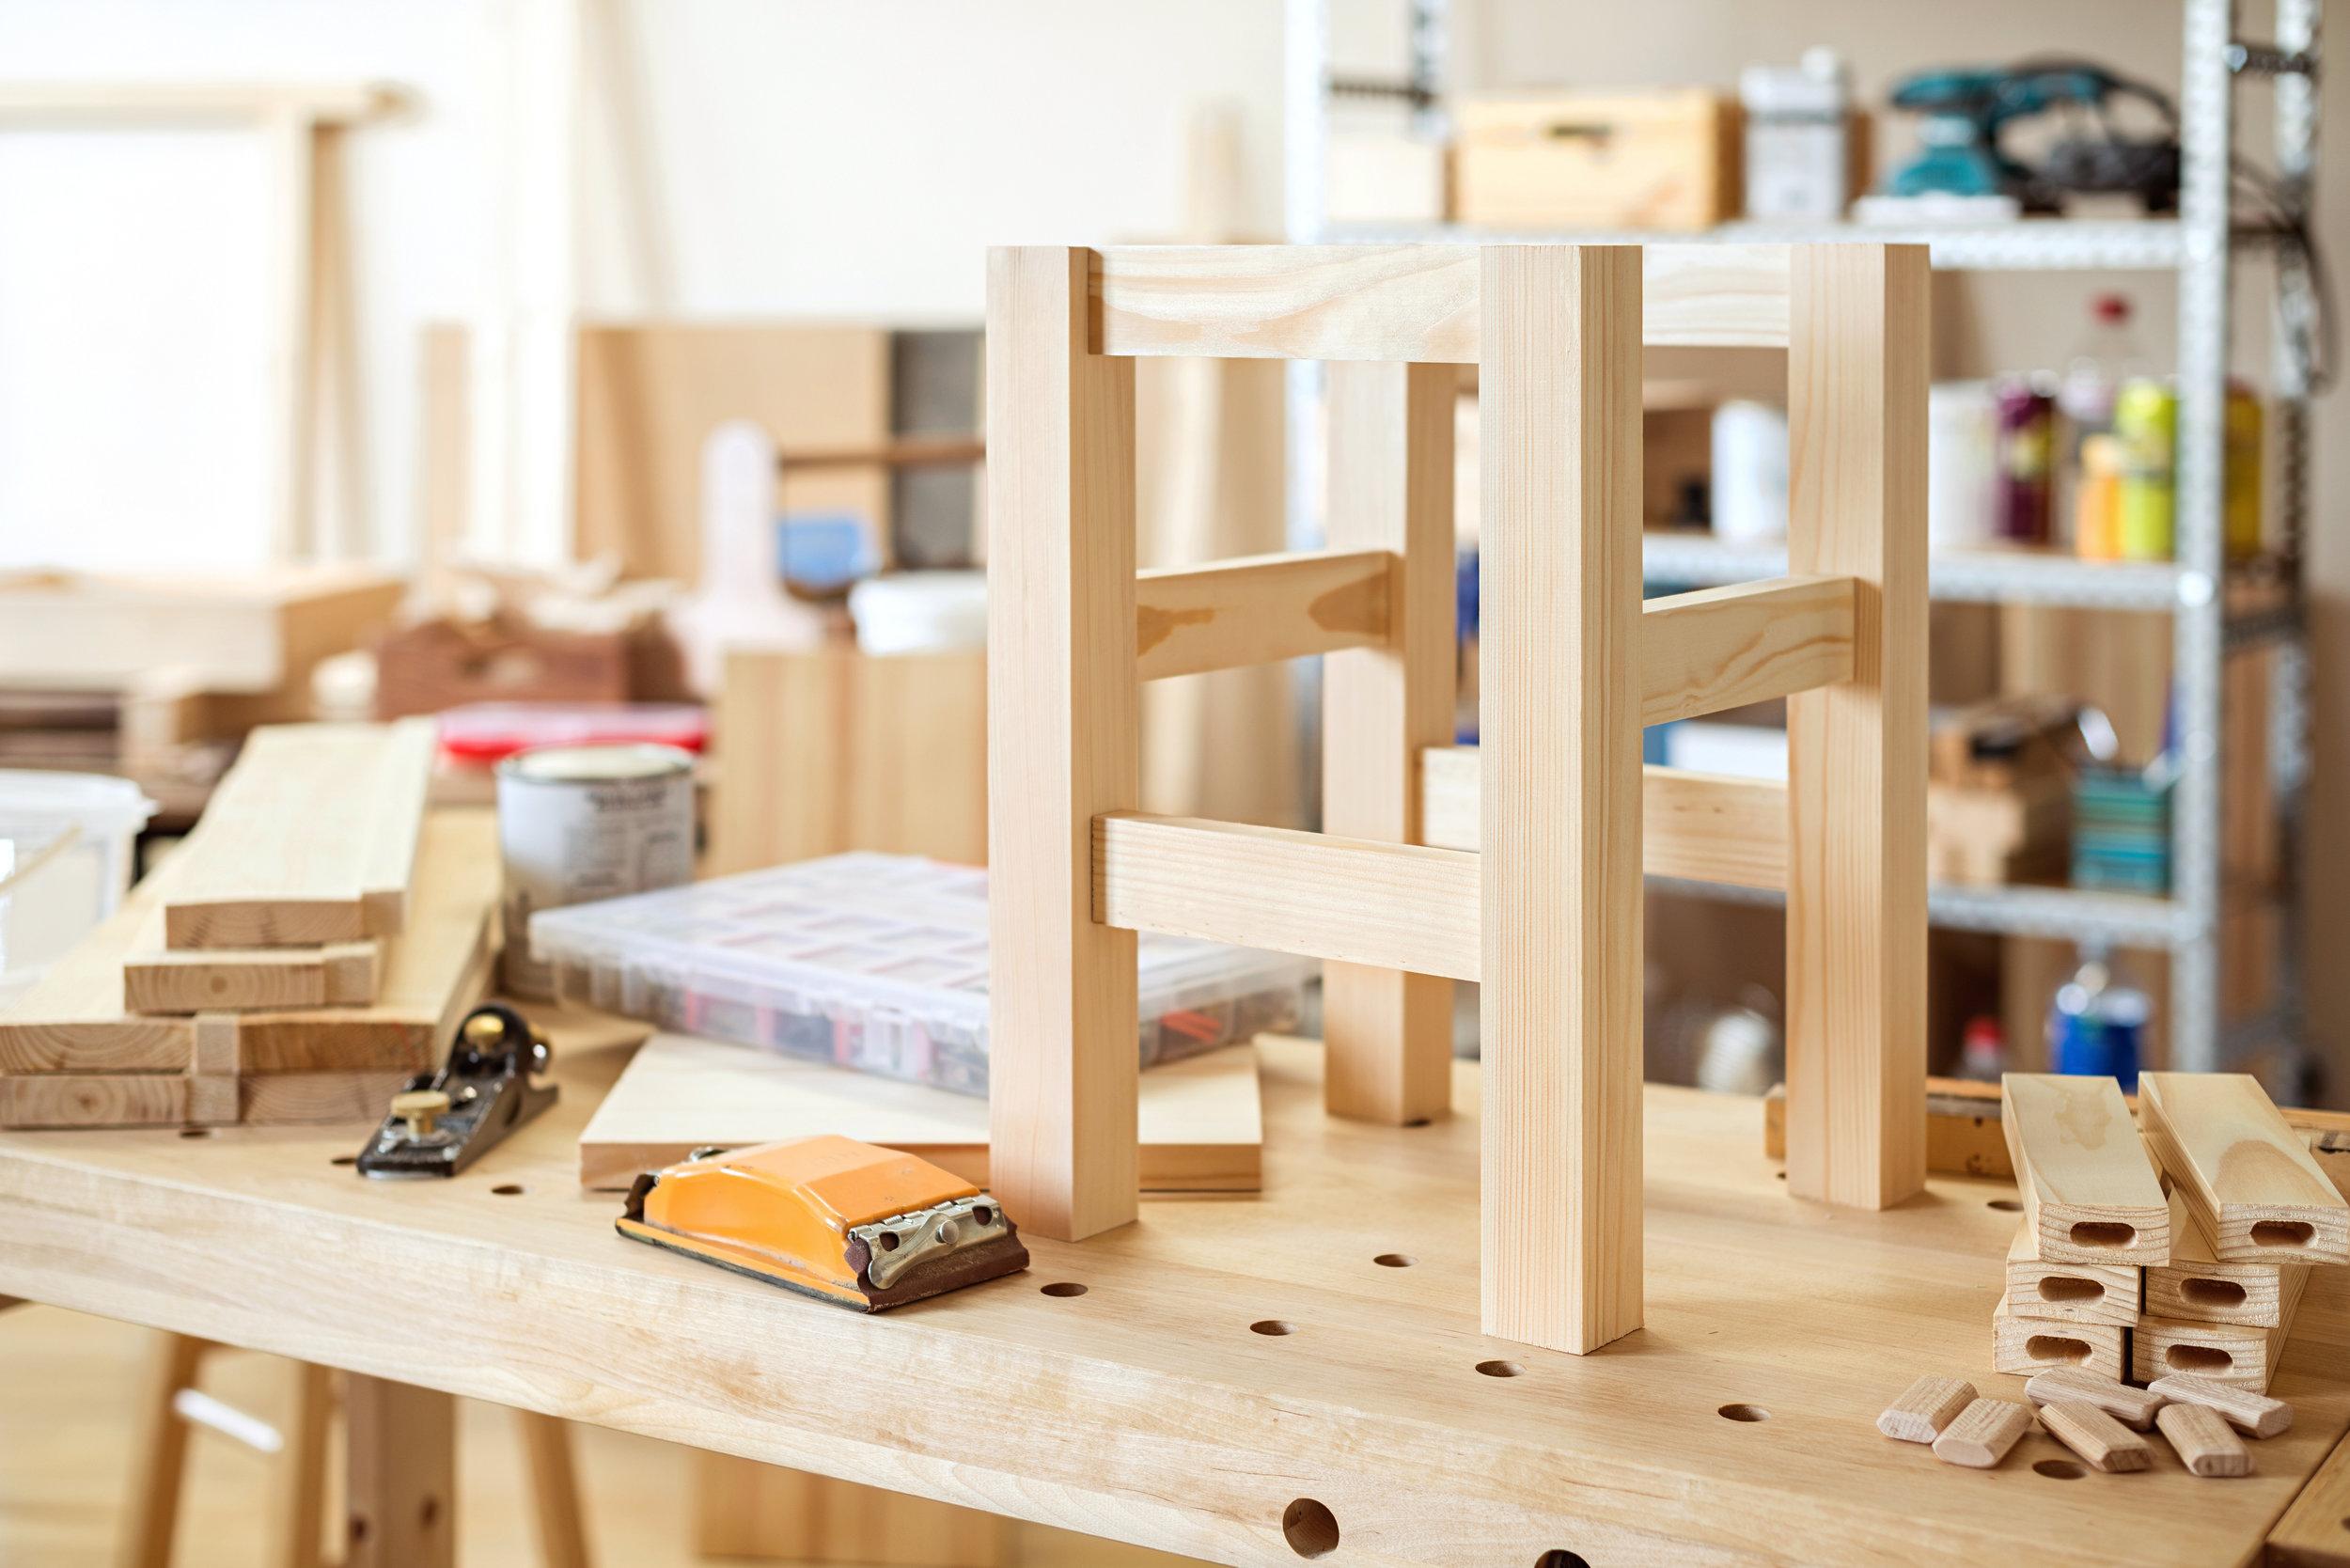 prototype chair workshop